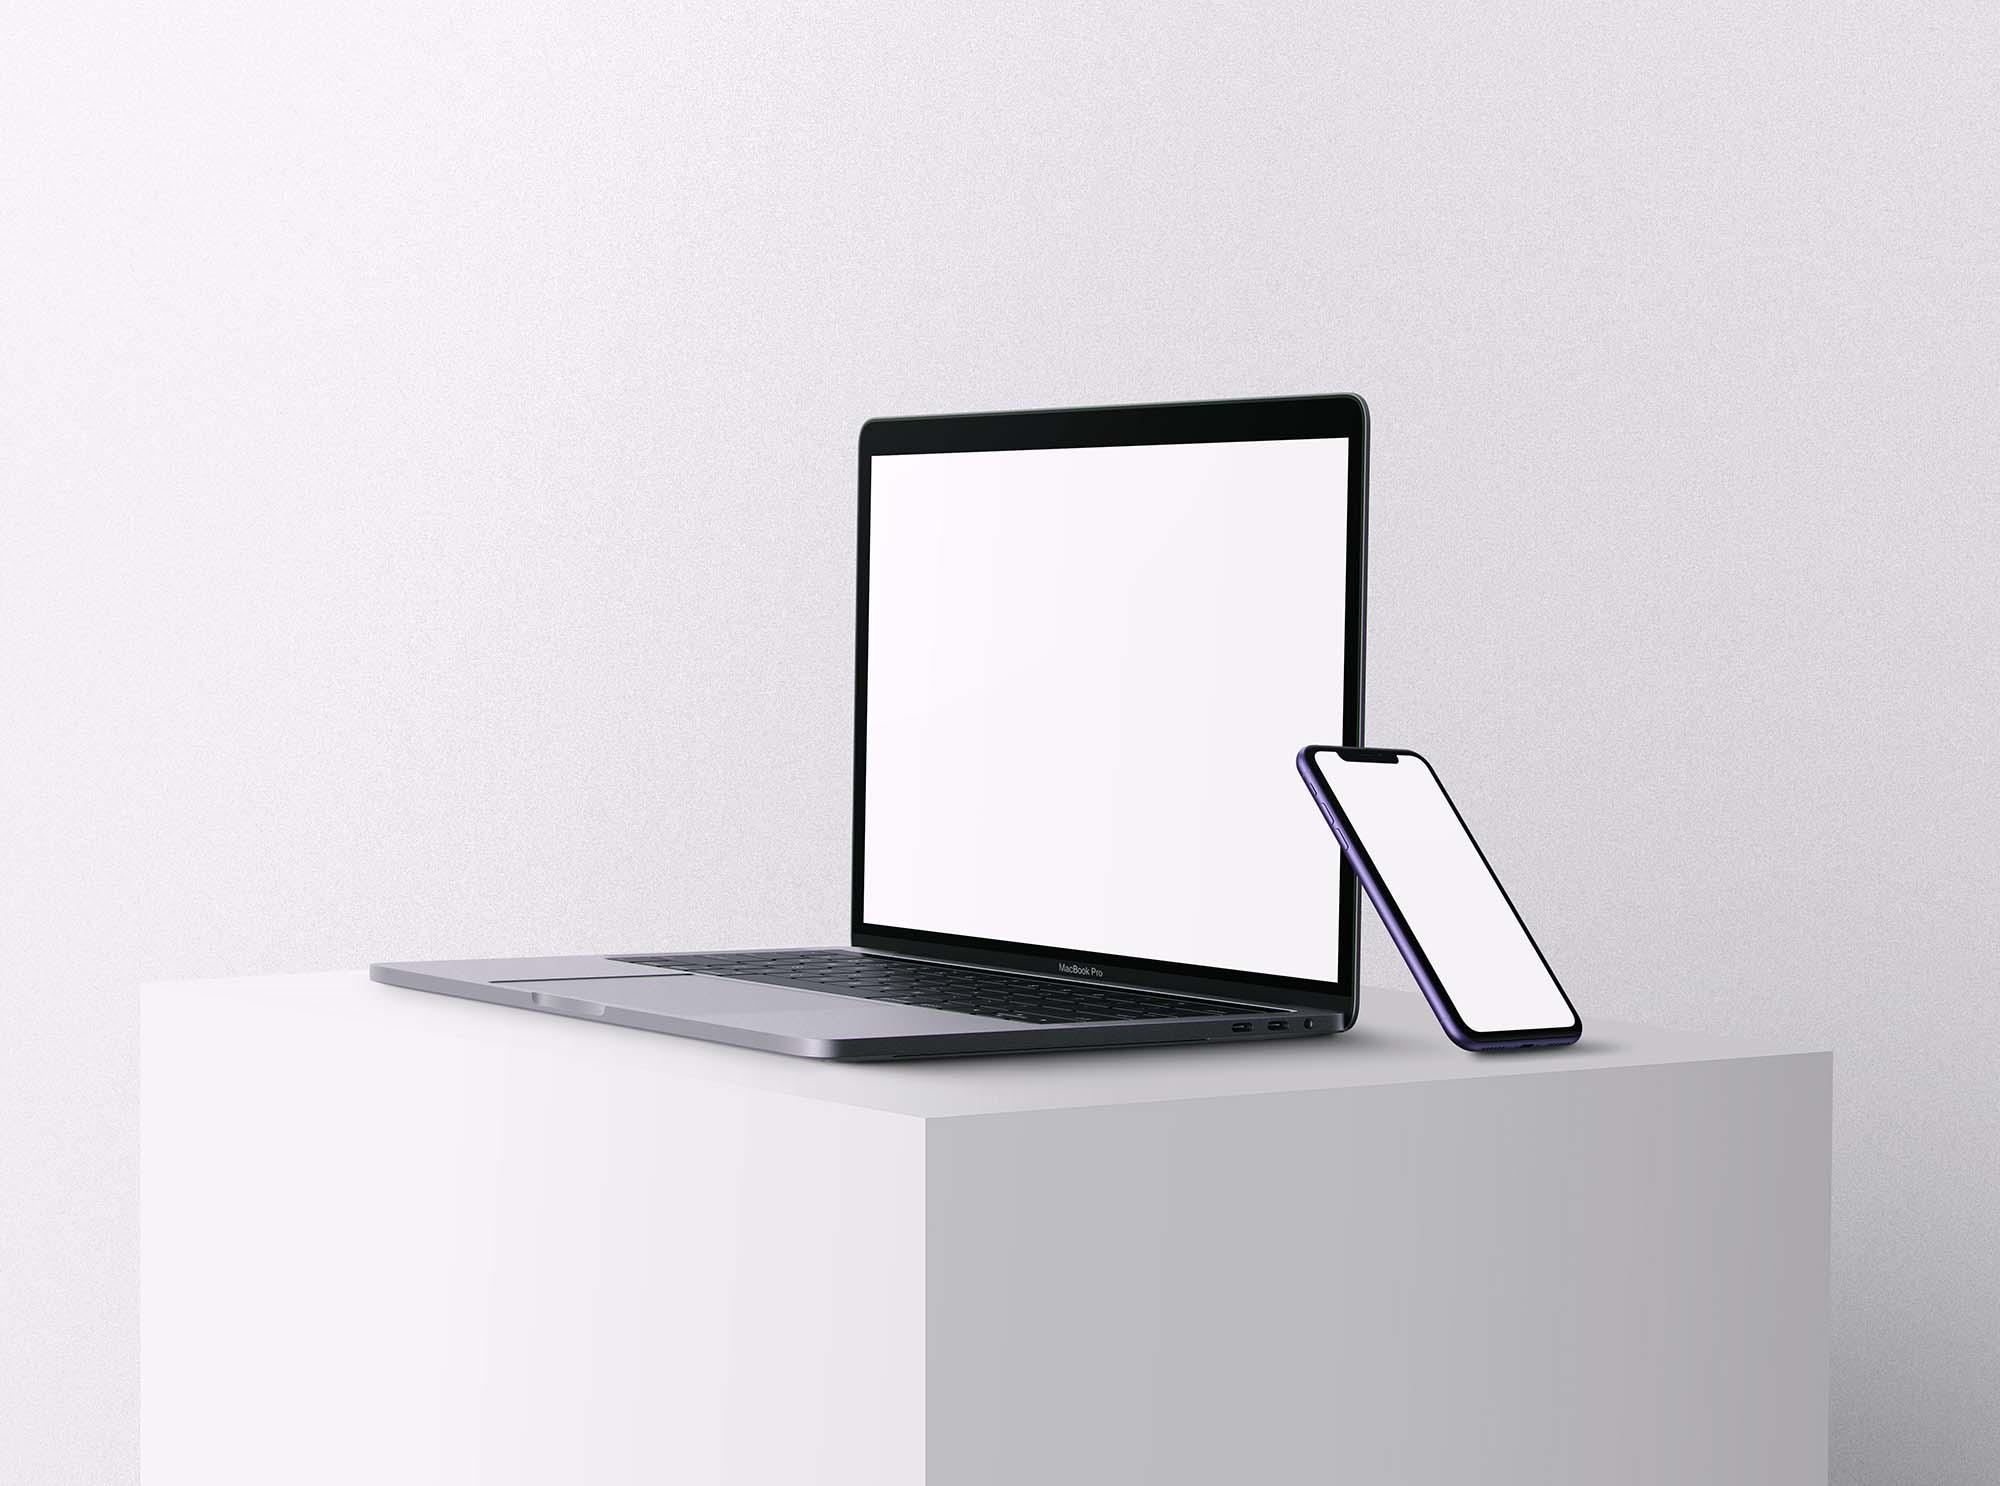 Apple iPhone 11 & Macbook Pro Mockup 2